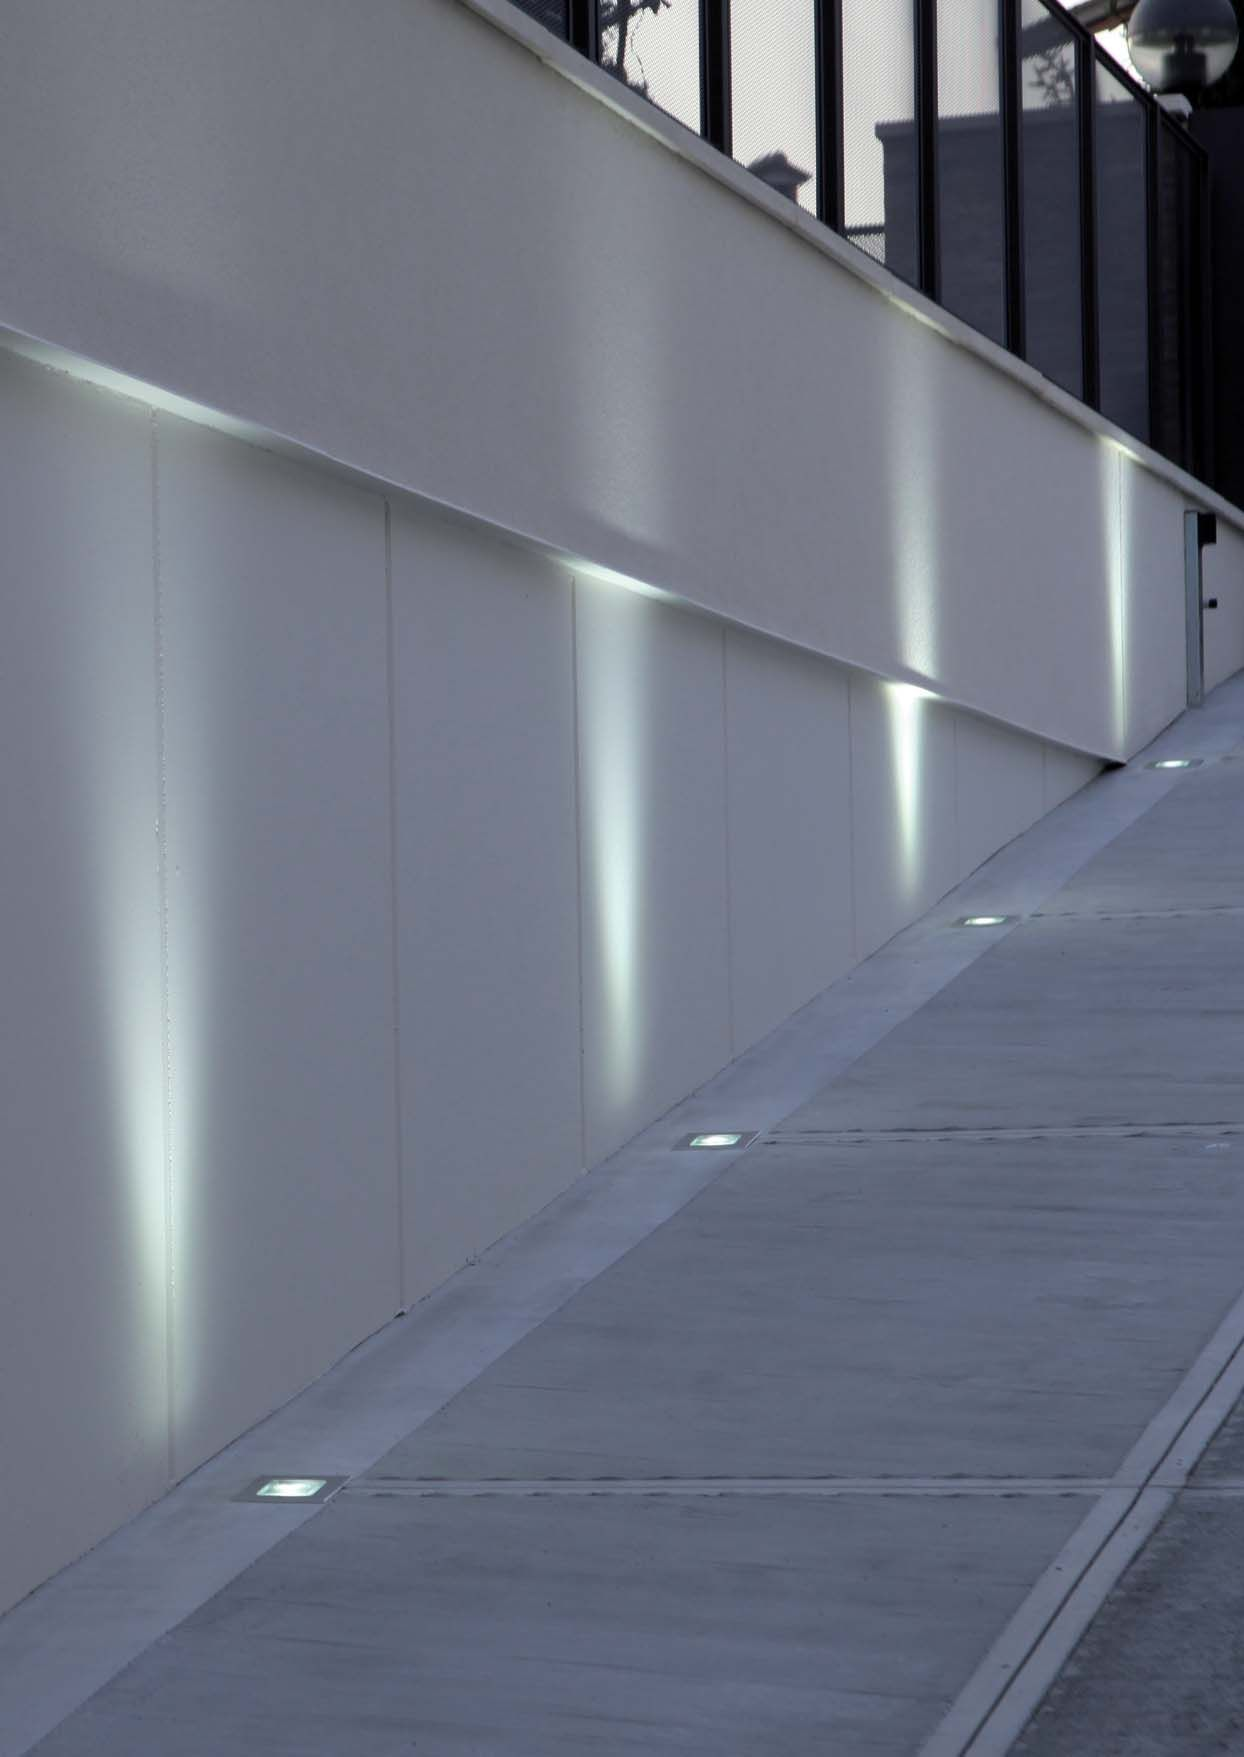 Iluminaci n t cnica para exterior con luz fluorescente for Exteriores espana